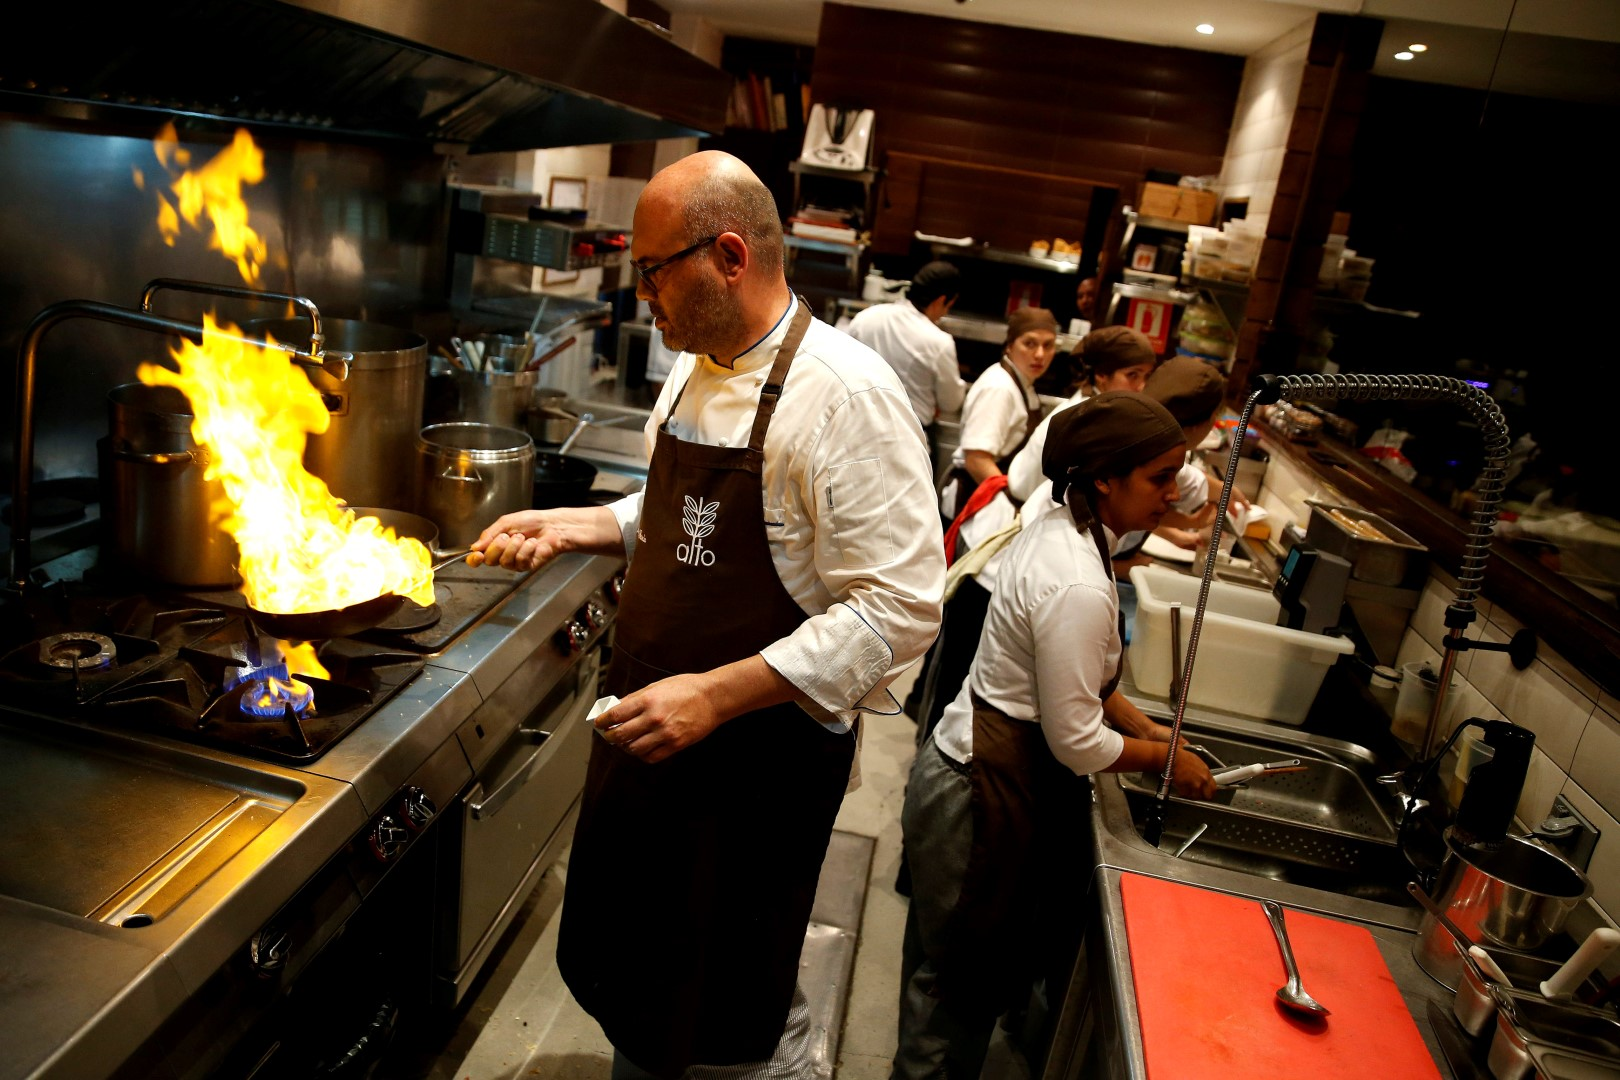 Chef Carlos Garcia (L) cooks within the kitchen of the Alto restaurant in Caracas, Venezuela June 29, 2017. Picture taken June 29, 2017. REUTERS/Ivan Alvarado - RC17E6B27420